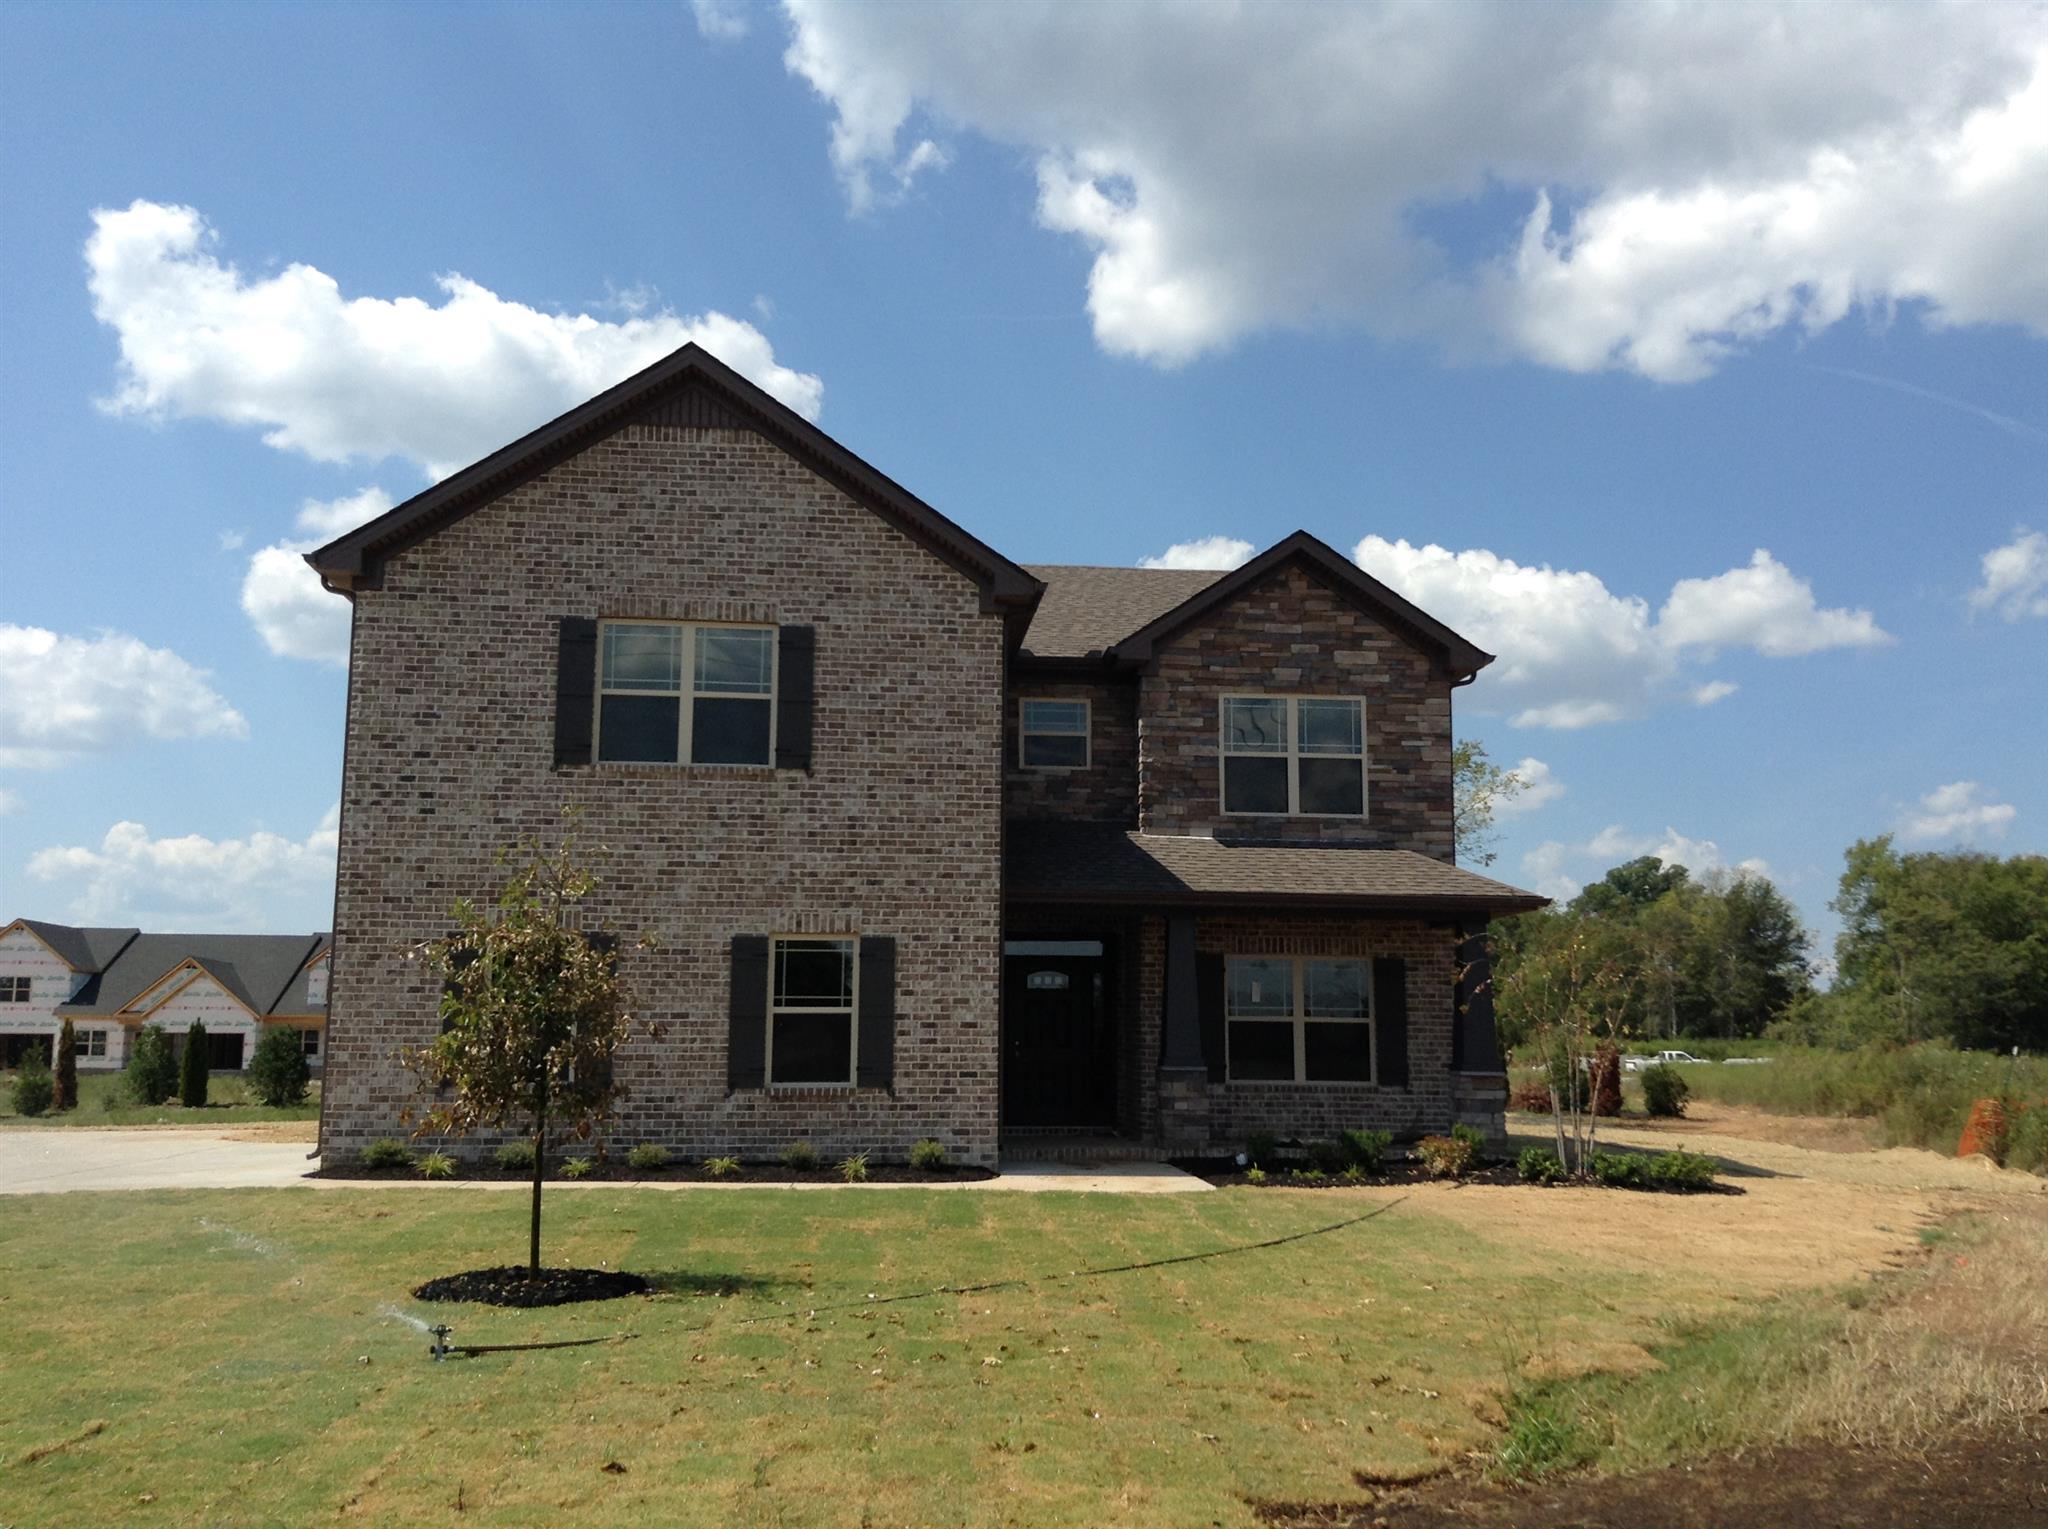 2906 Saint Andrews Dr, Murfreesboro, TN 37128